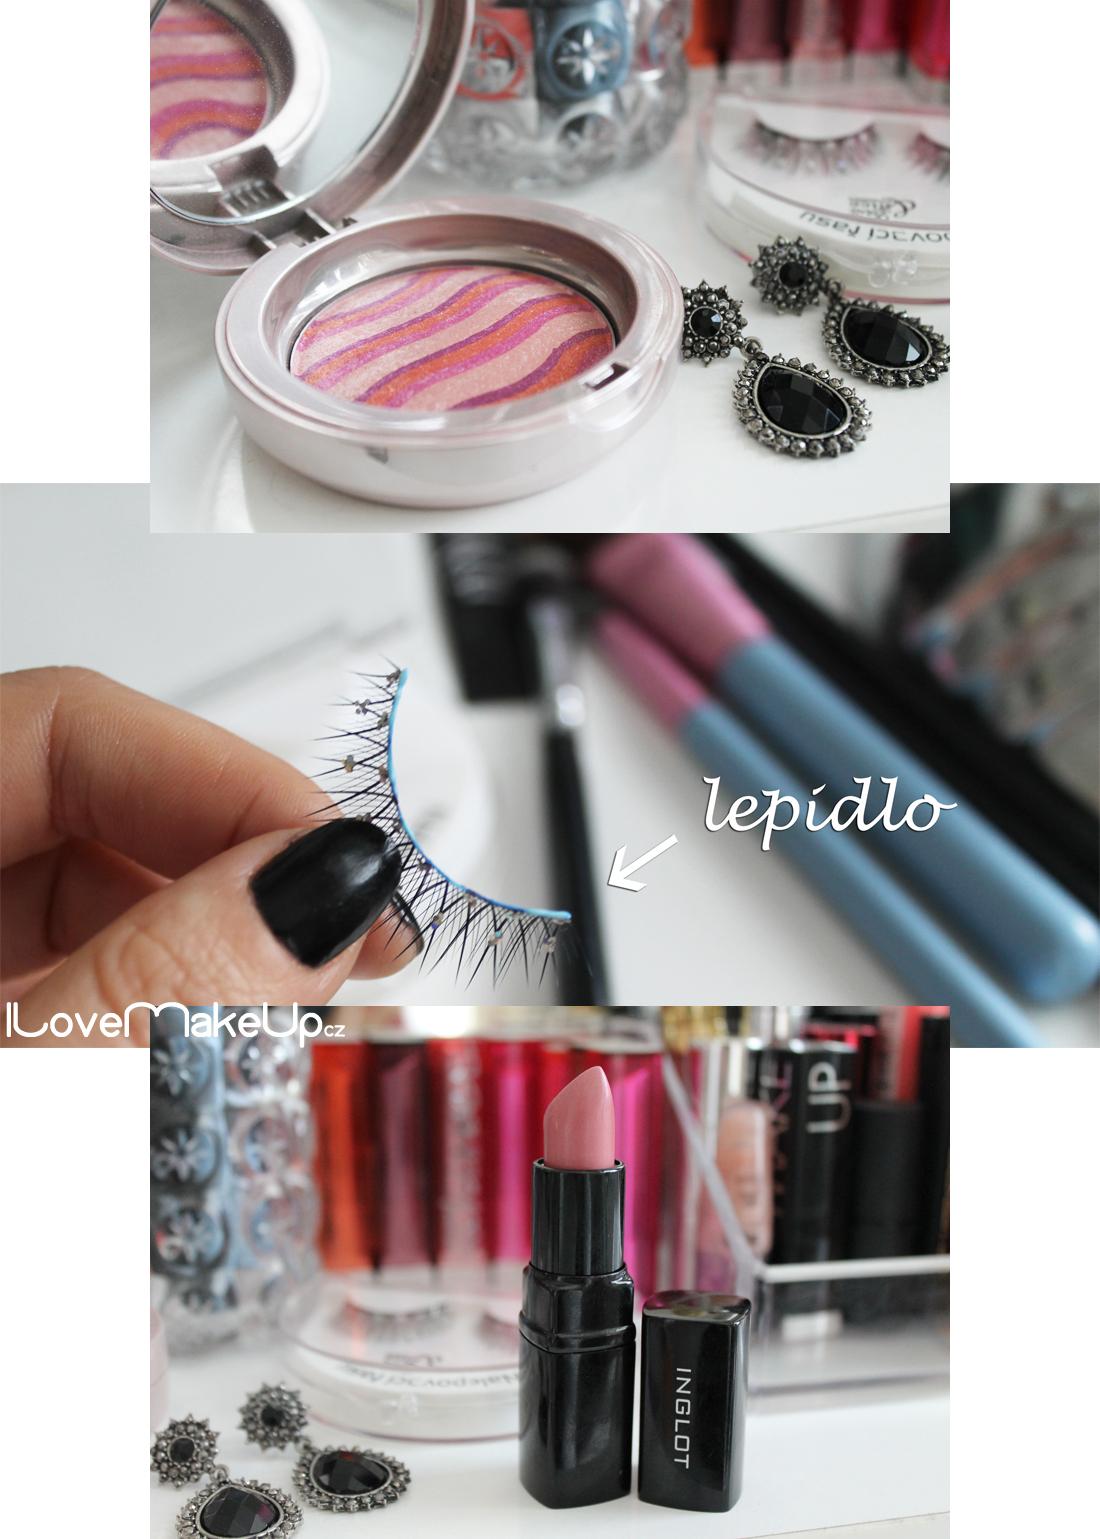 Plesove Zelene Liceni Makeup Ilovemakeup